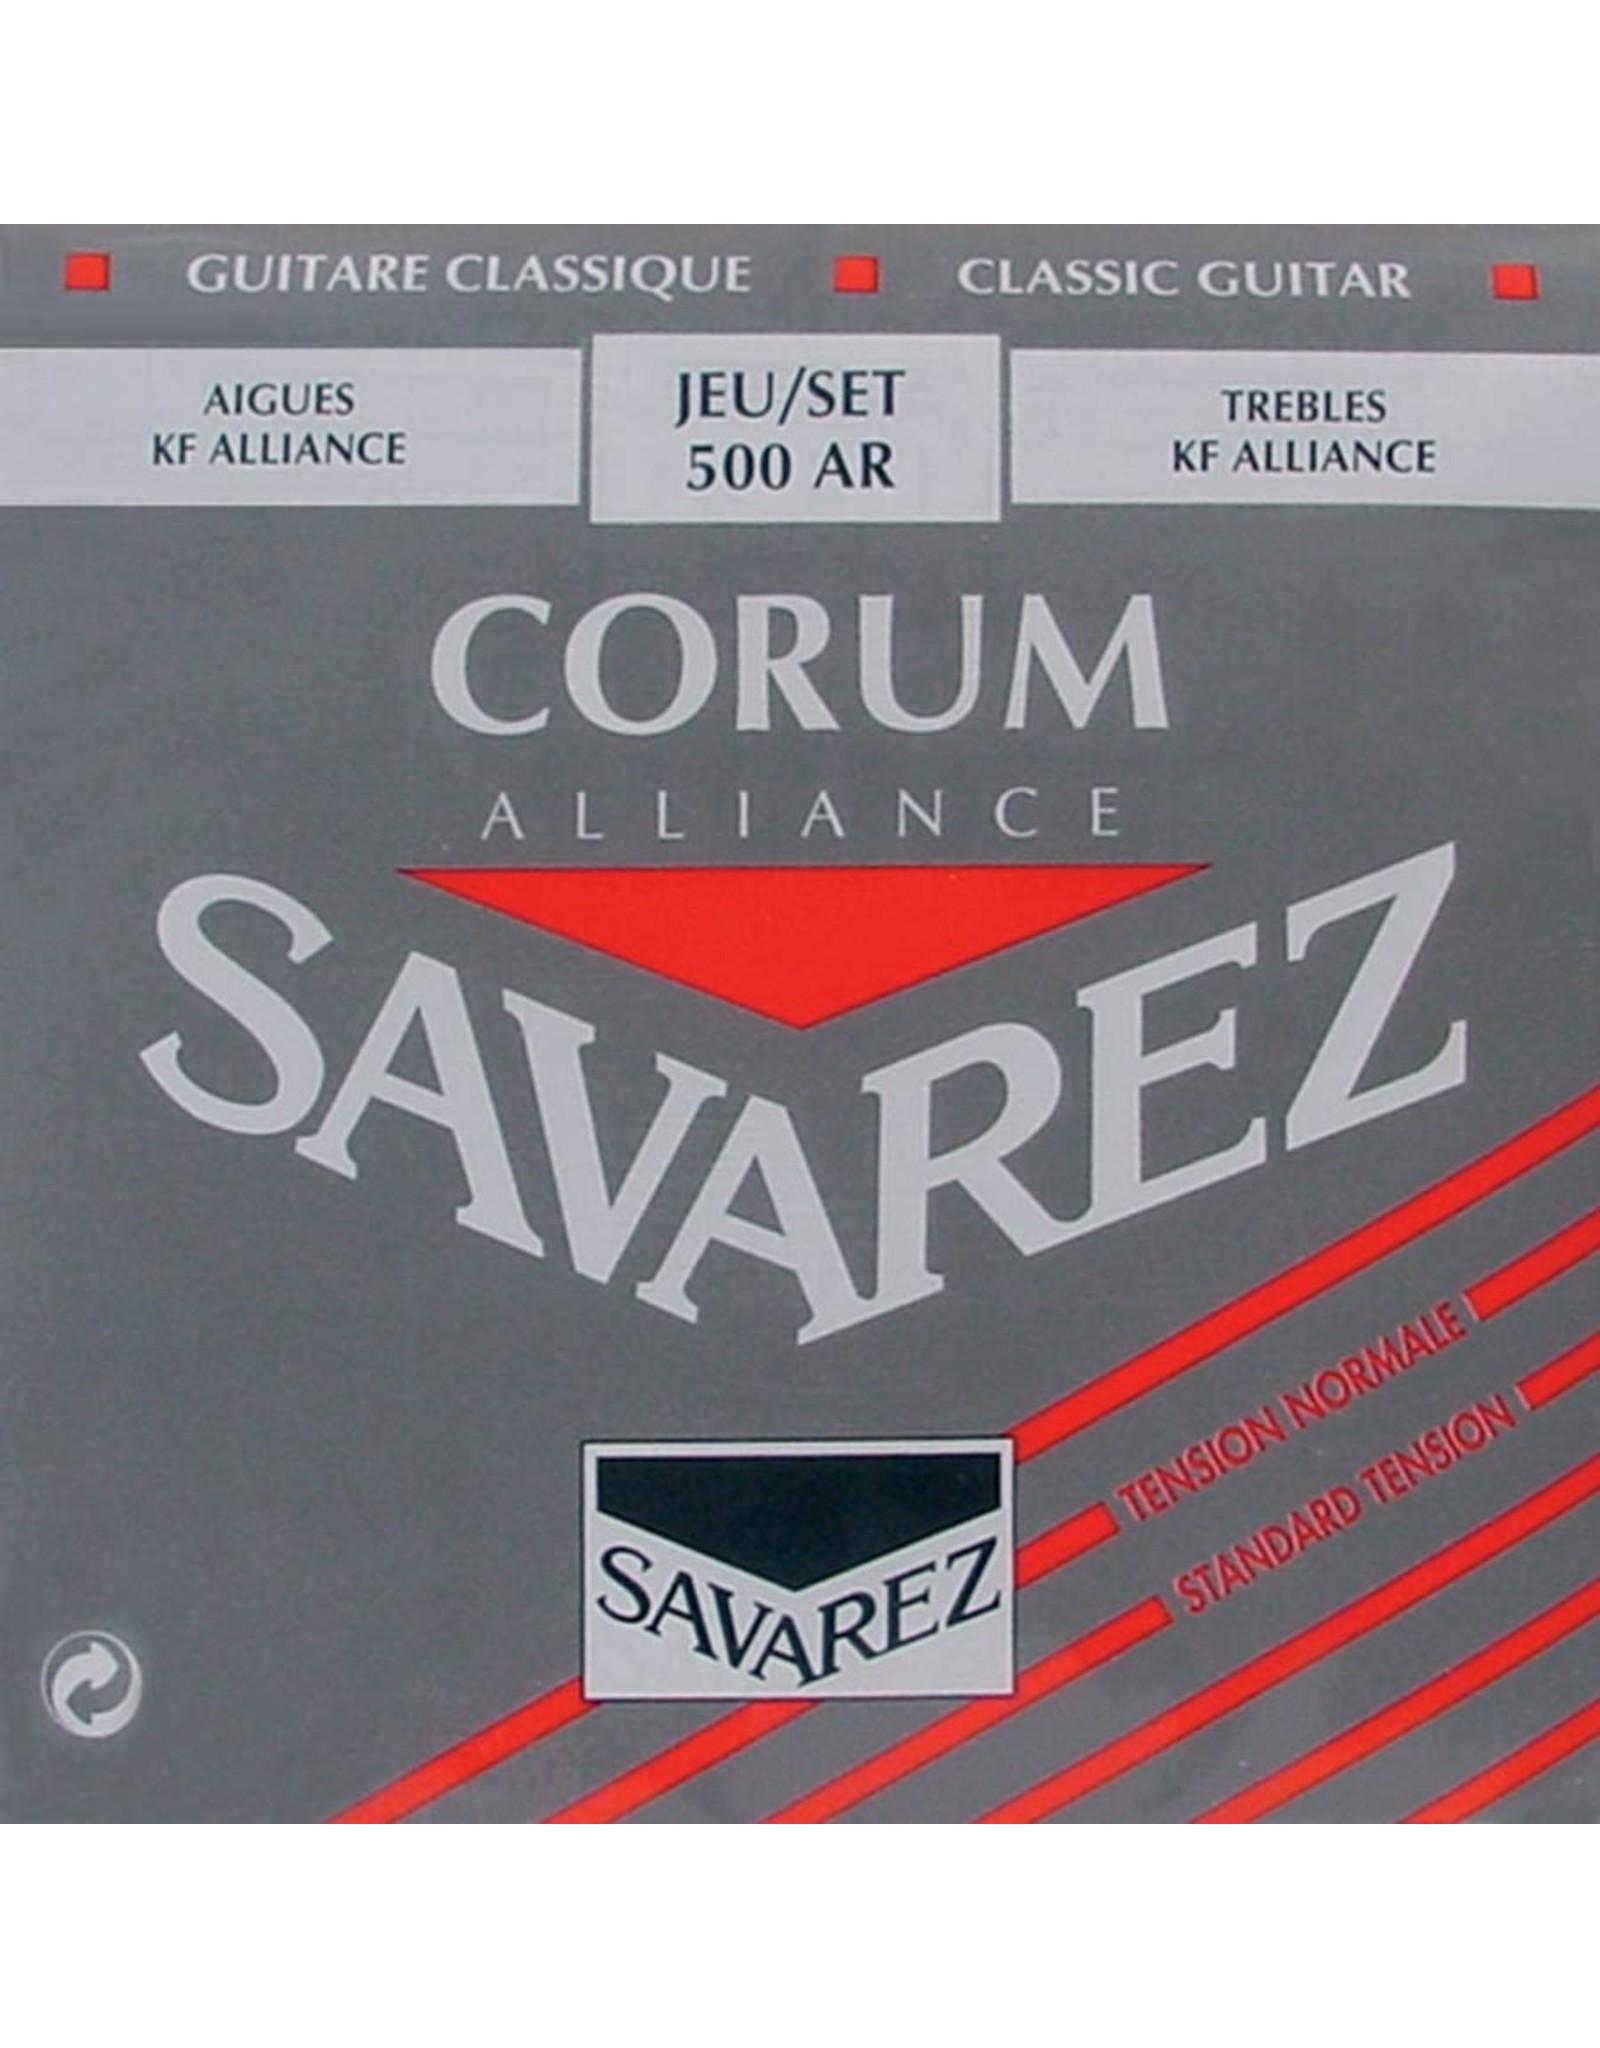 Savarez Savarez Corum Alliance 500-AR medium tension